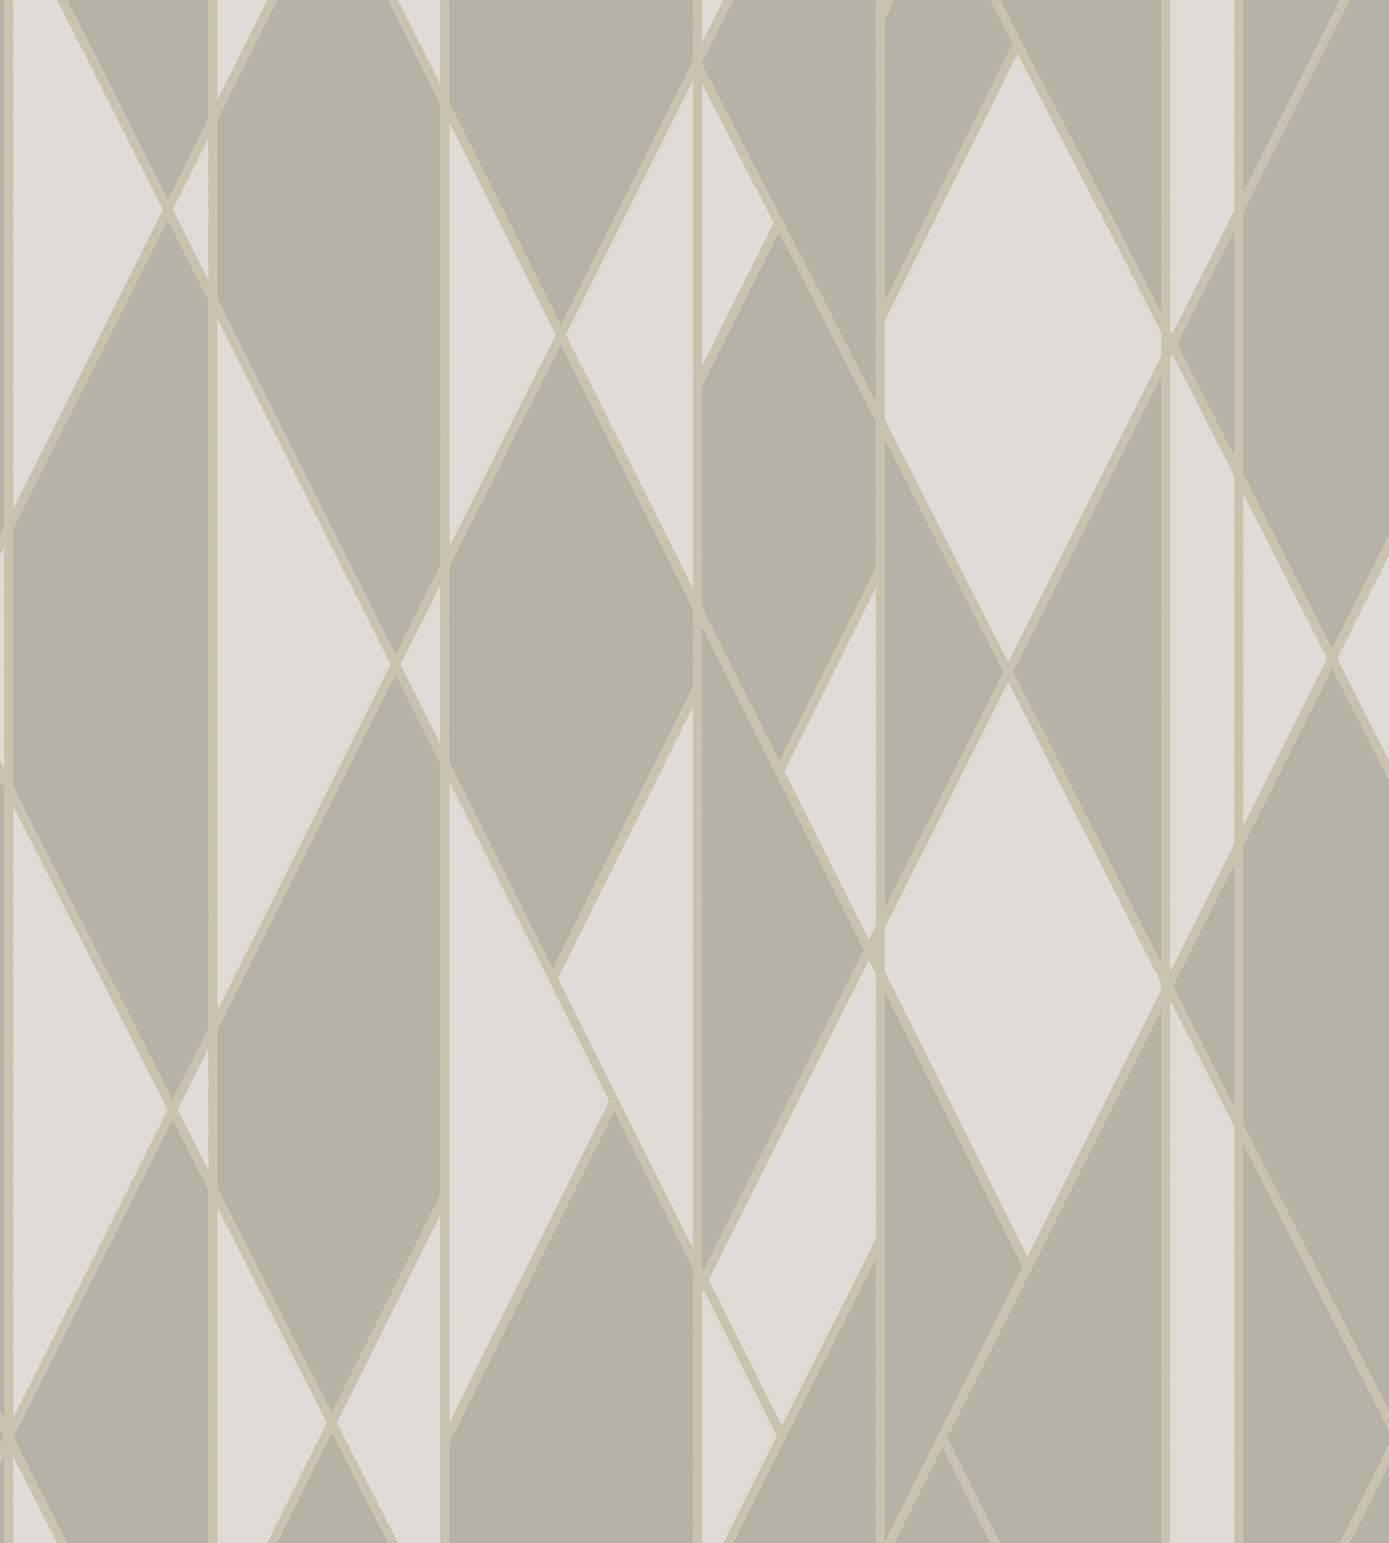 Обои Cole & Son Geometric II 105/11046, интернет магазин Волео